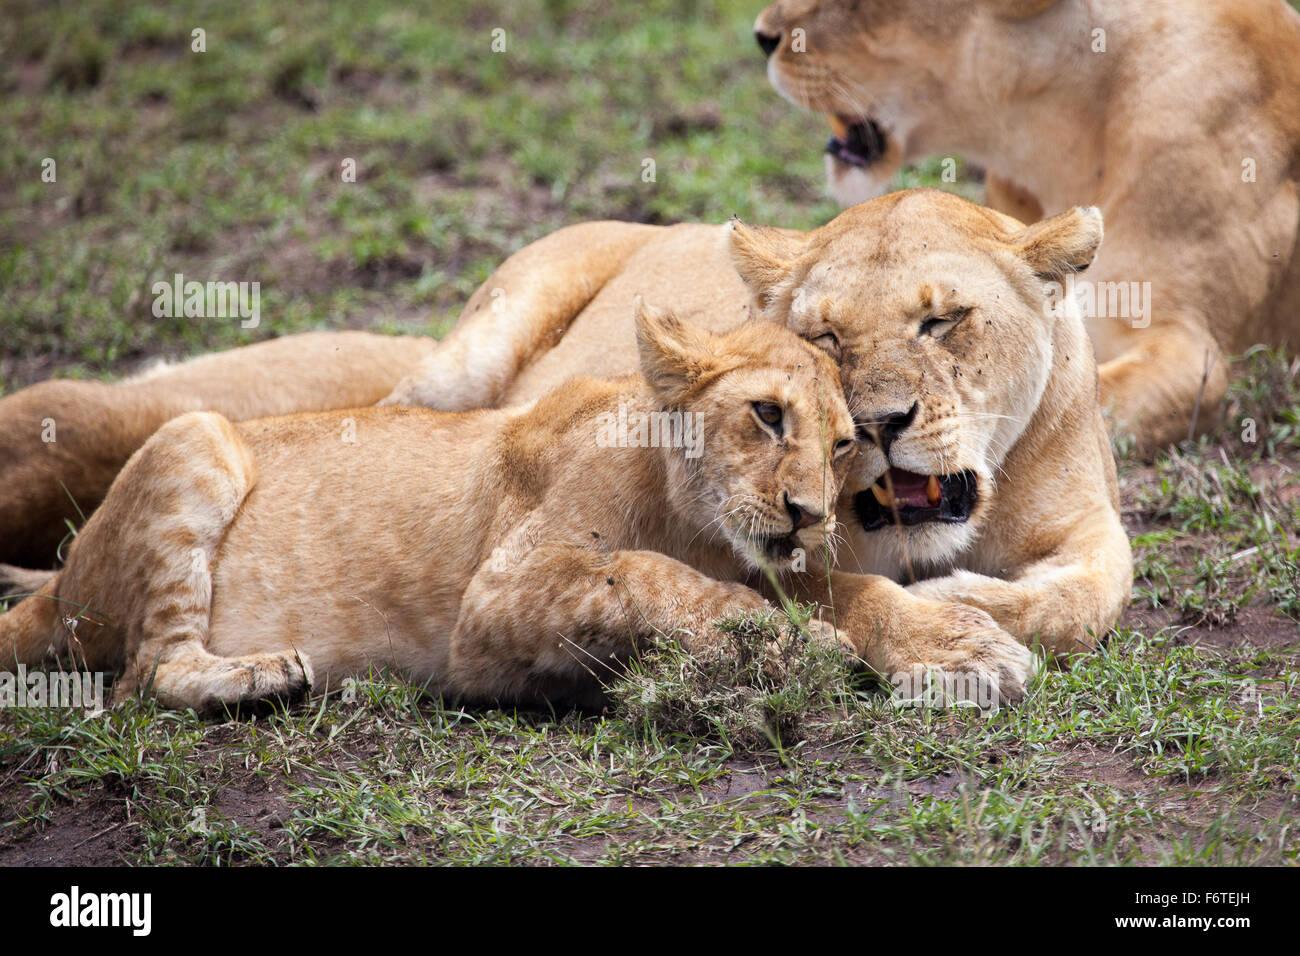 Lioness and cub rubbing heads, Serengeti, Tanzania, Africa - Stock Image